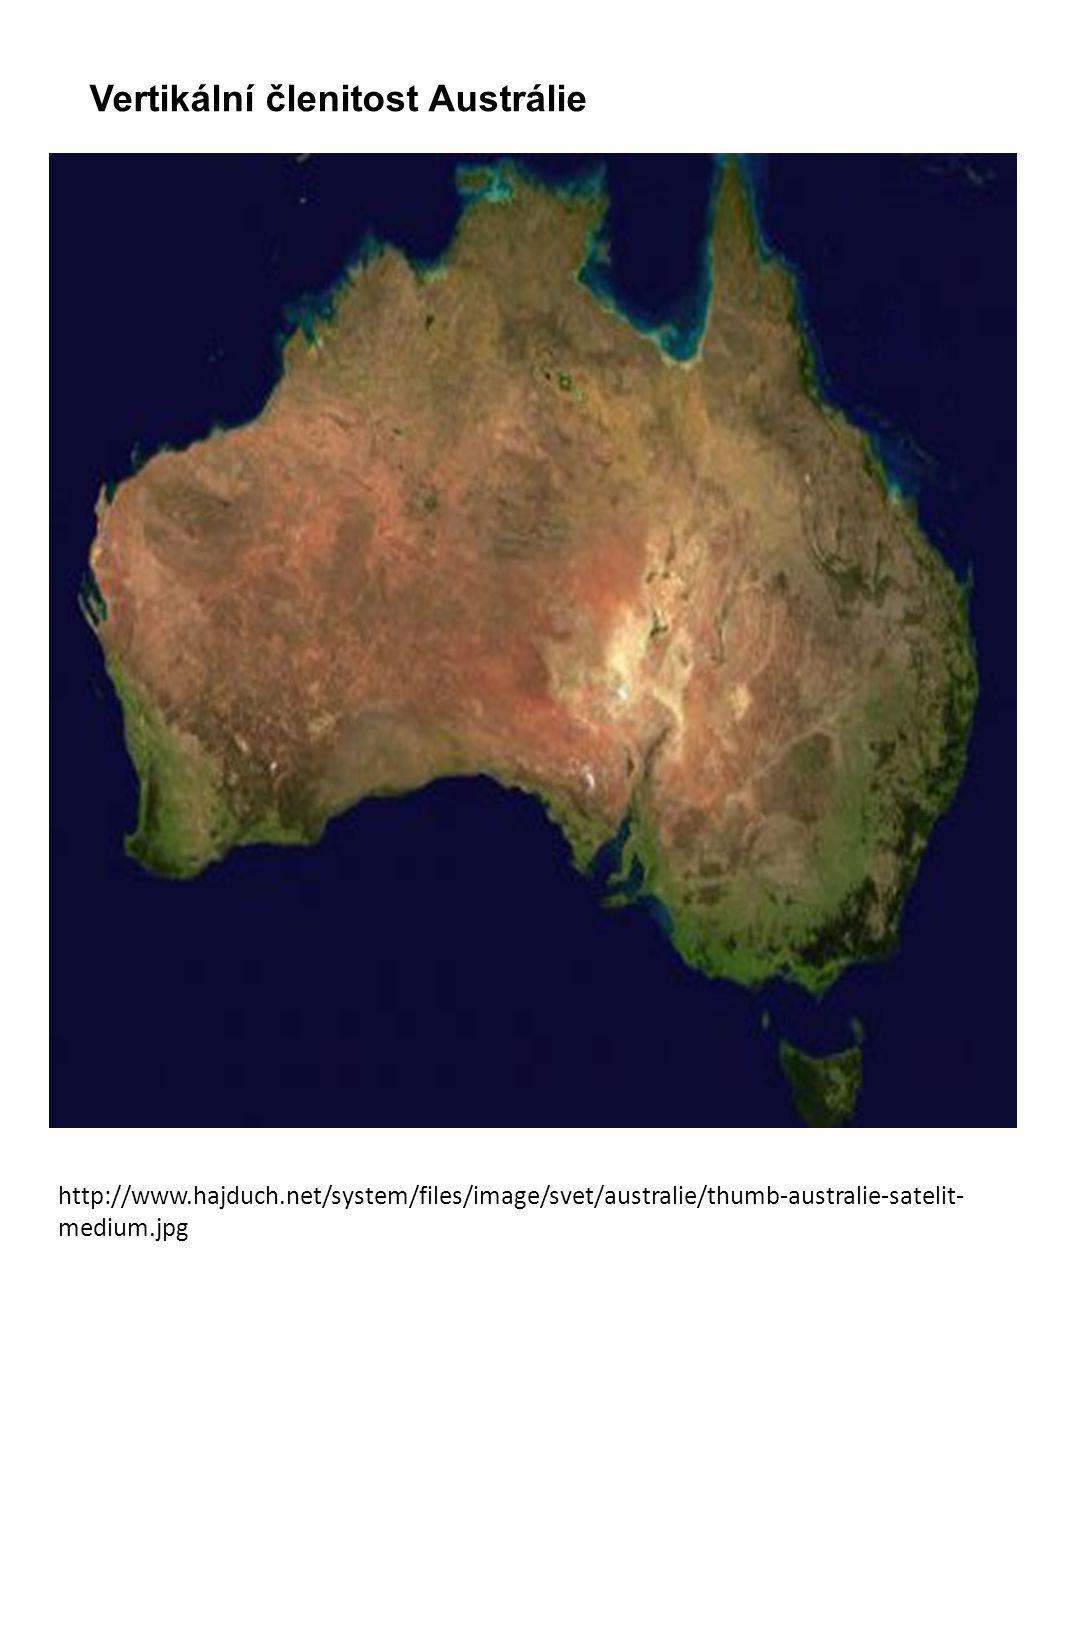 http://www.hajduch.net/system/files/image/svet/australie/thumb-australie-satelit- medium.jpg Vertikální členitost Austrálie